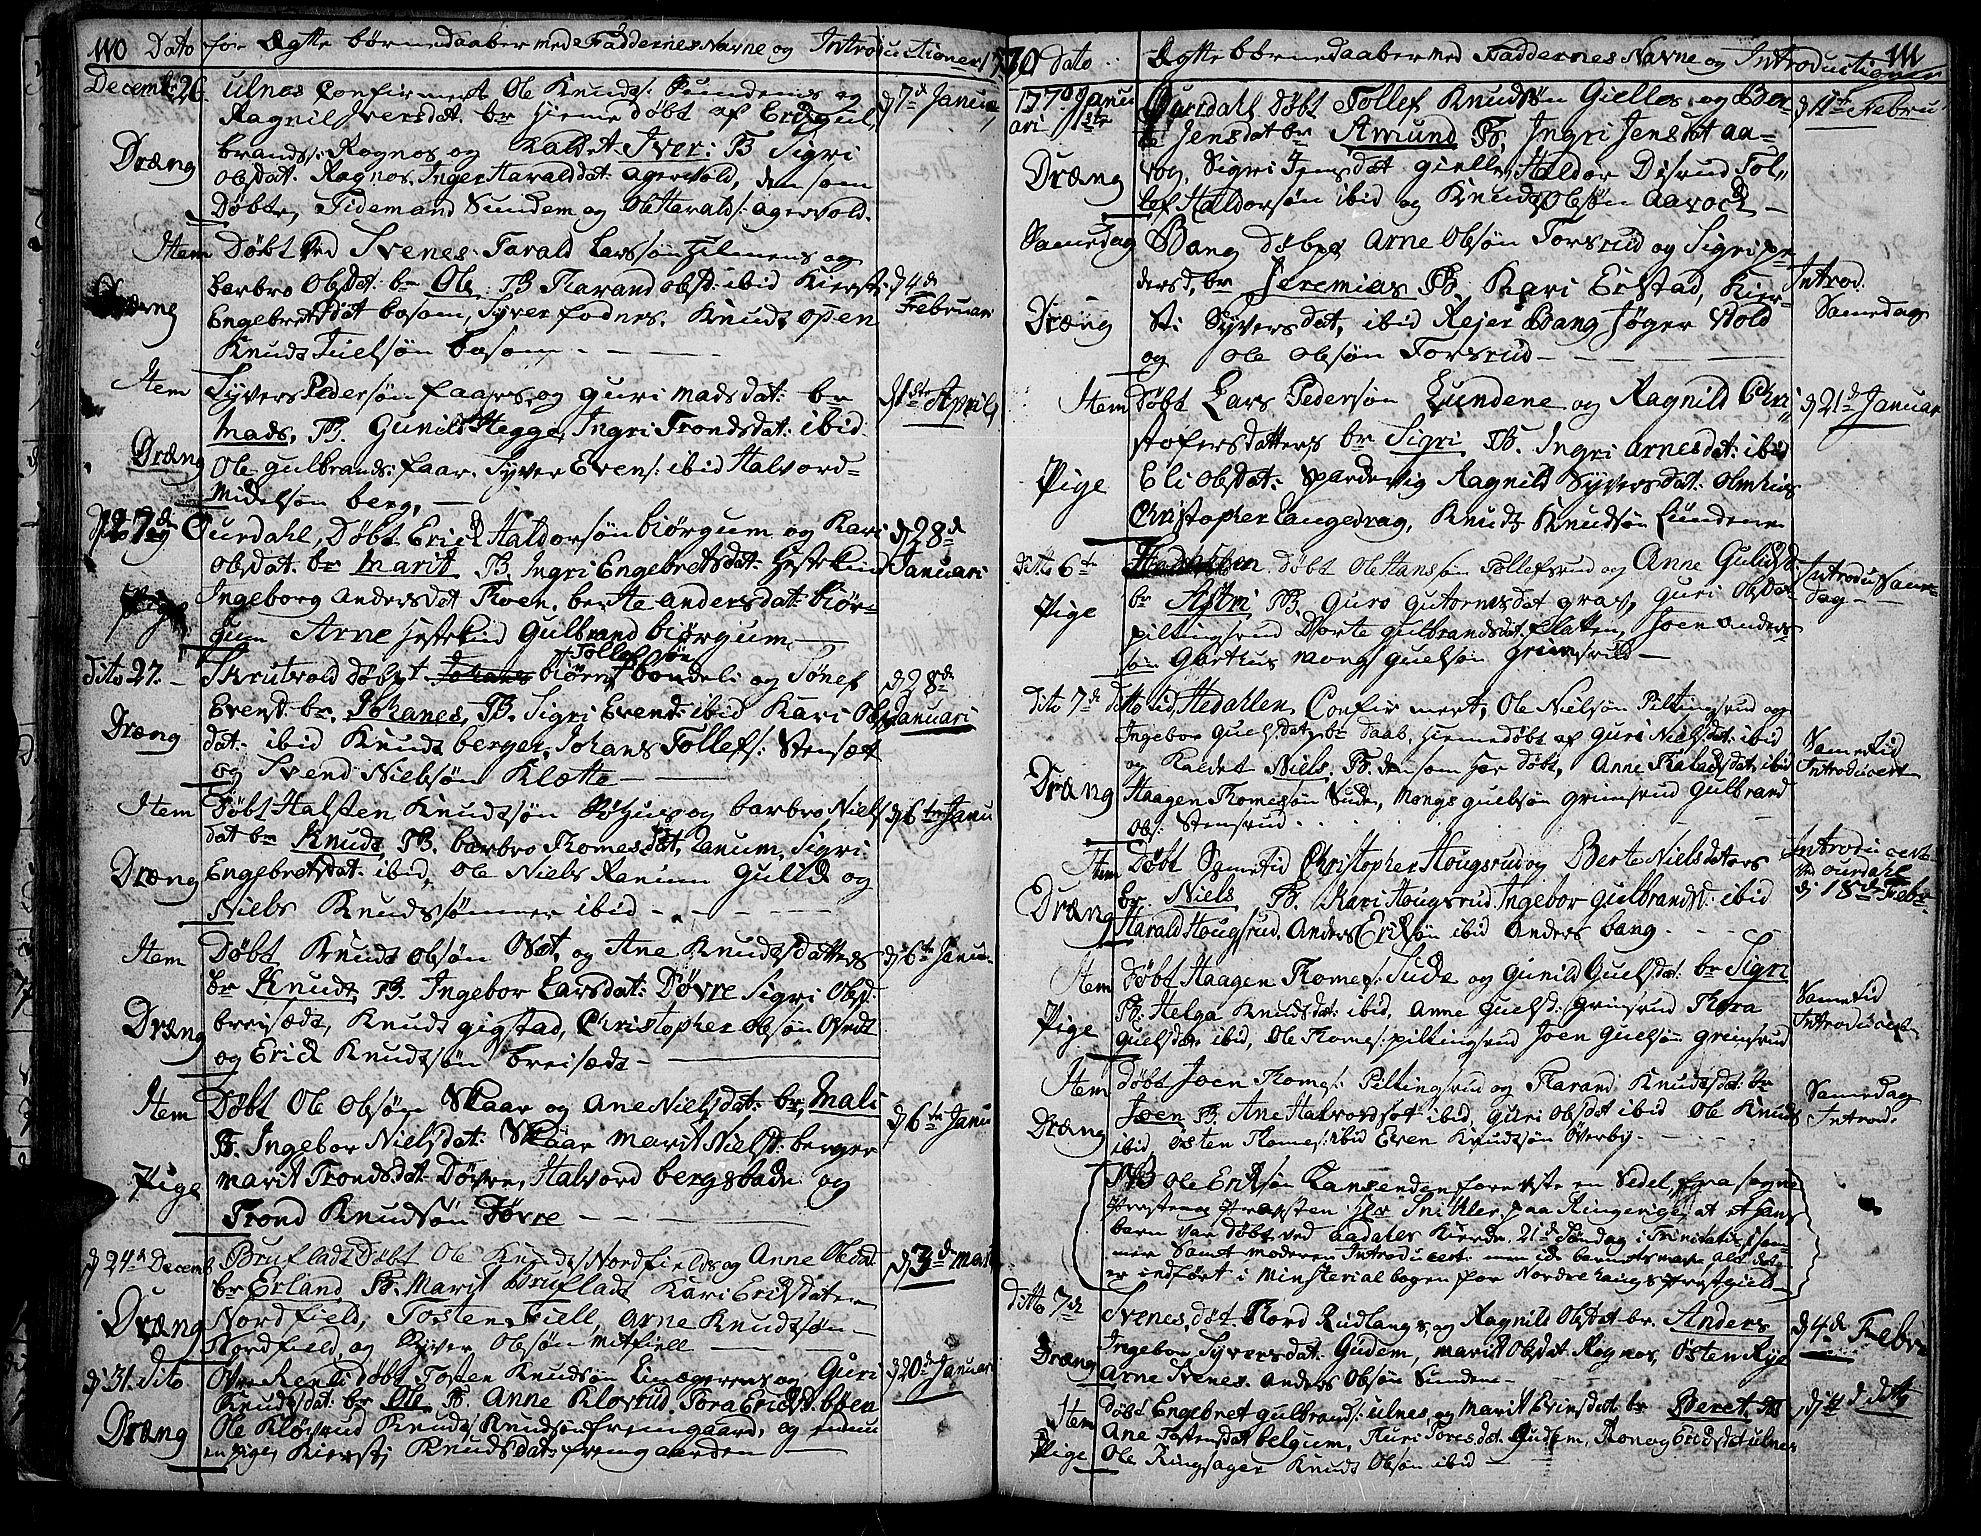 SAH, Aurdal prestekontor, Ministerialbok nr. 5, 1763-1781, s. 110-111